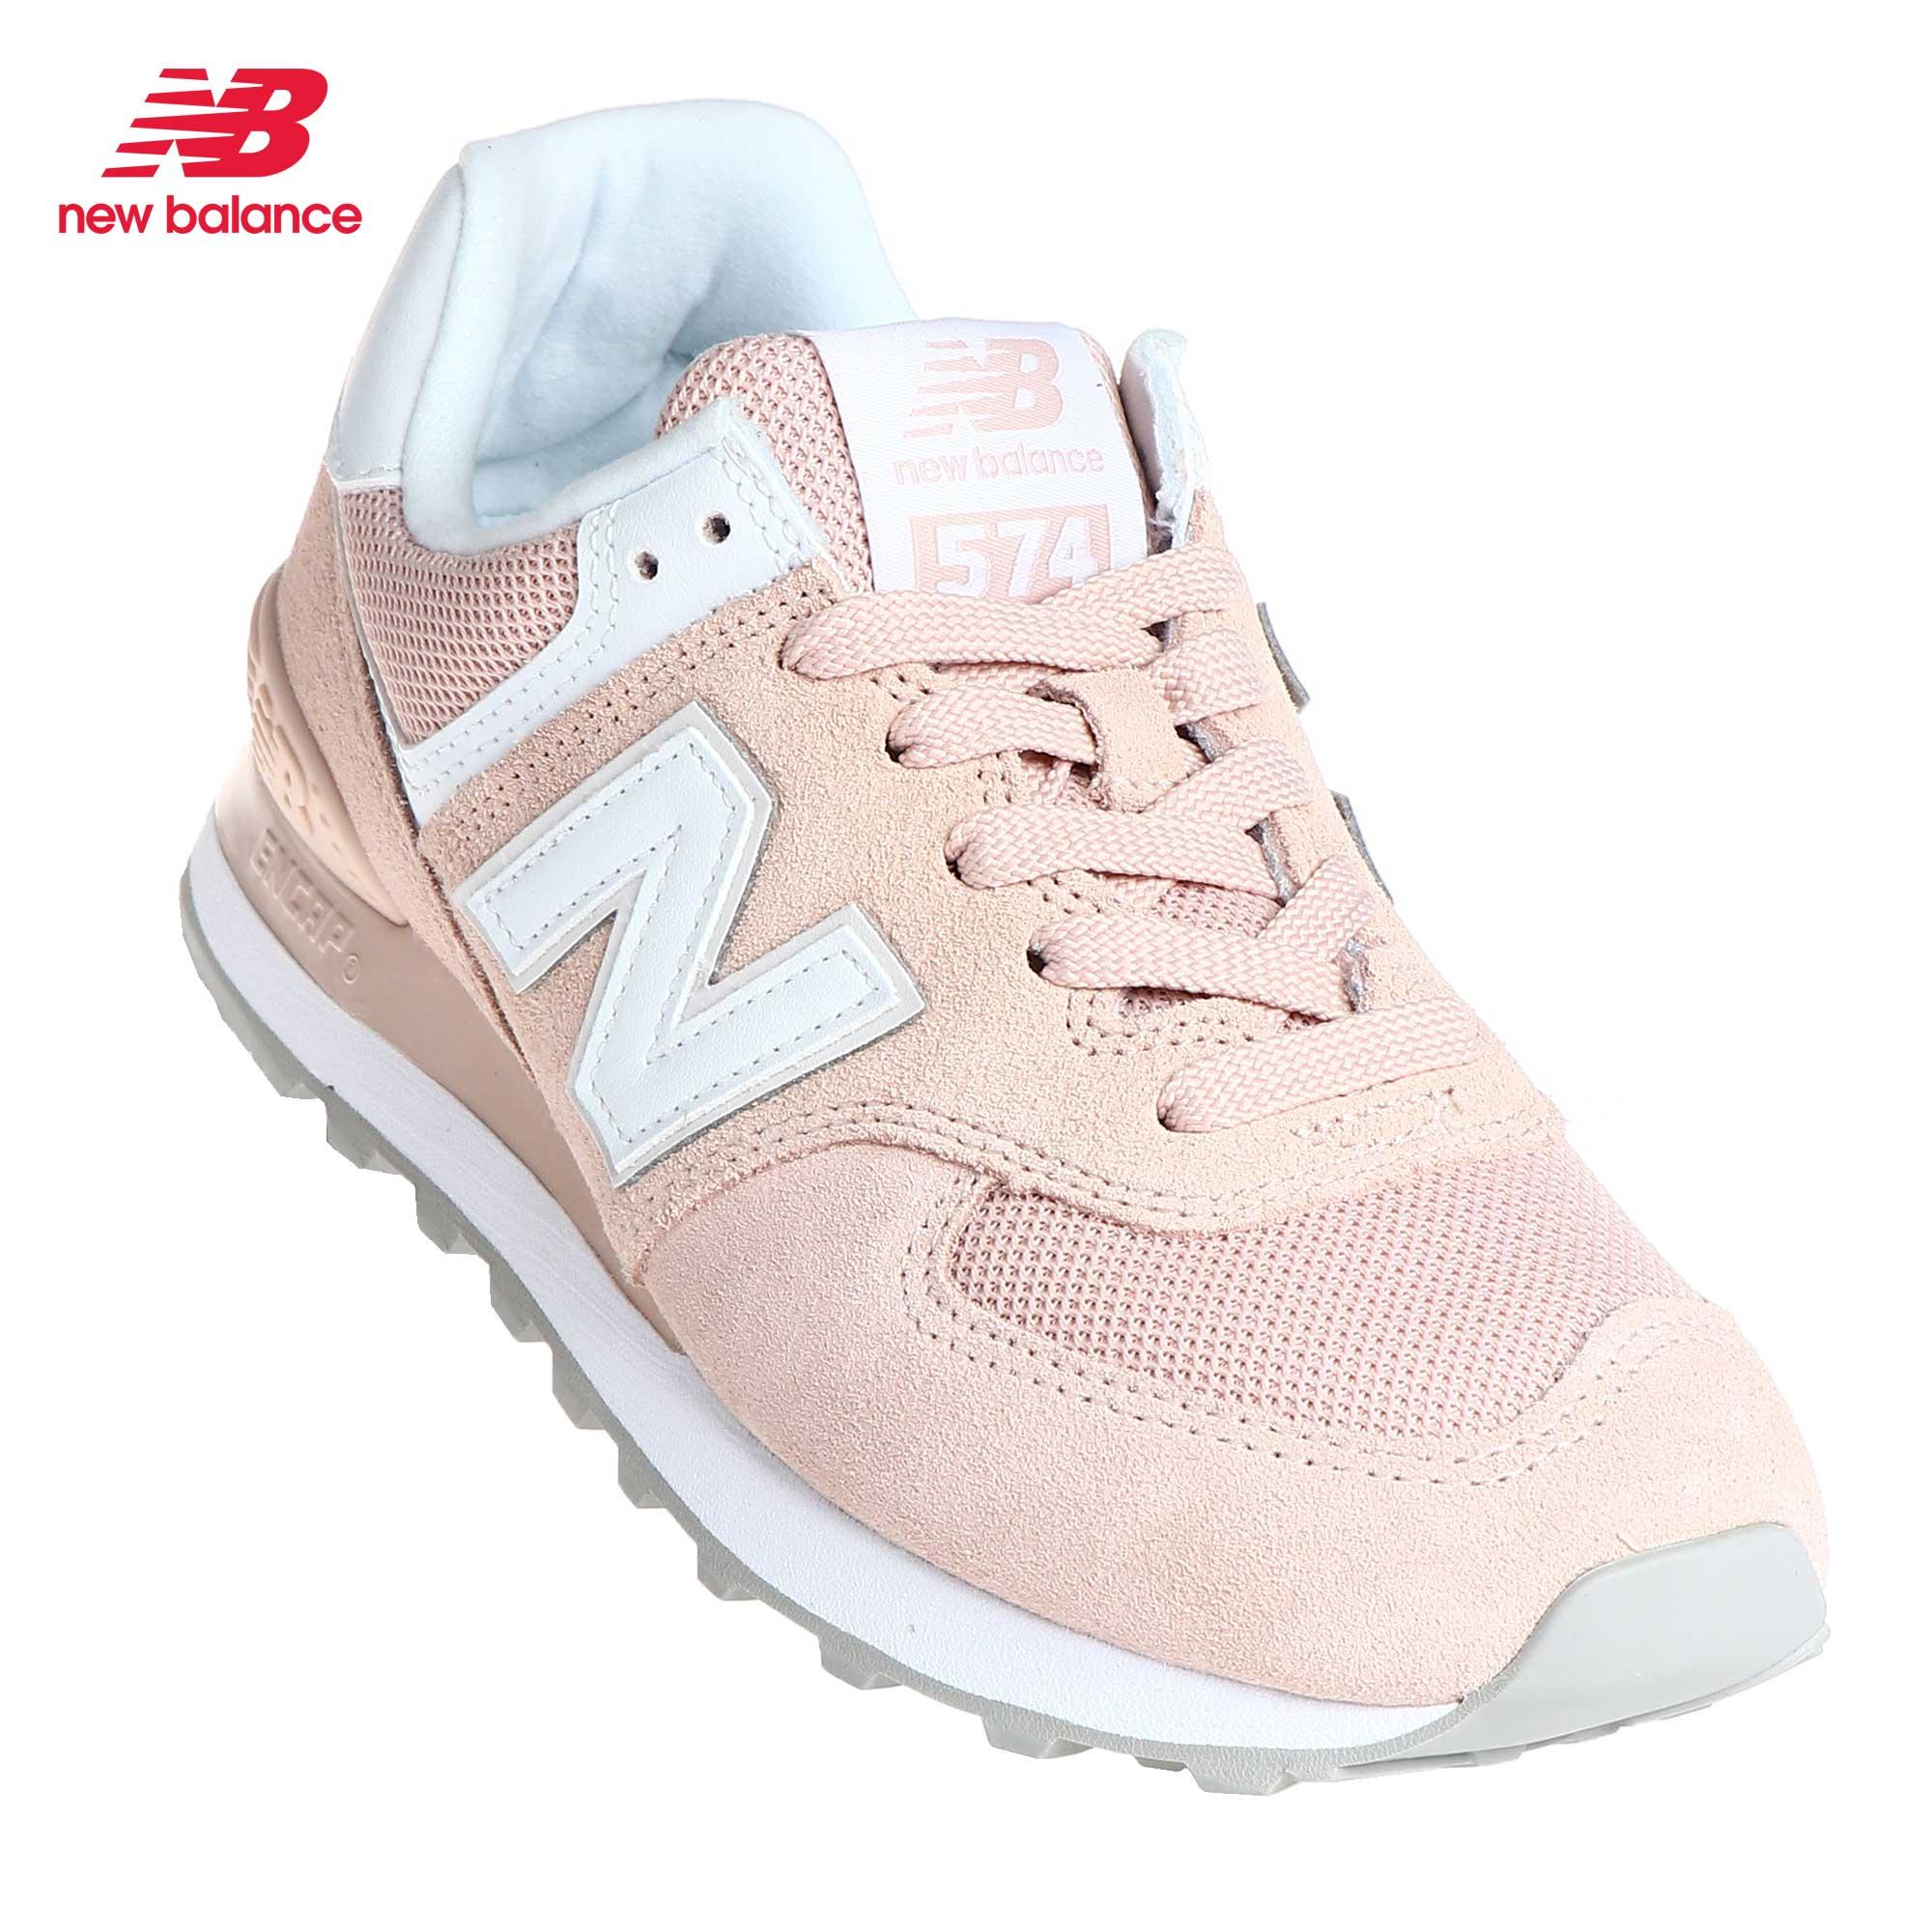 New Balance 574 Classic Lifestyle Shoes